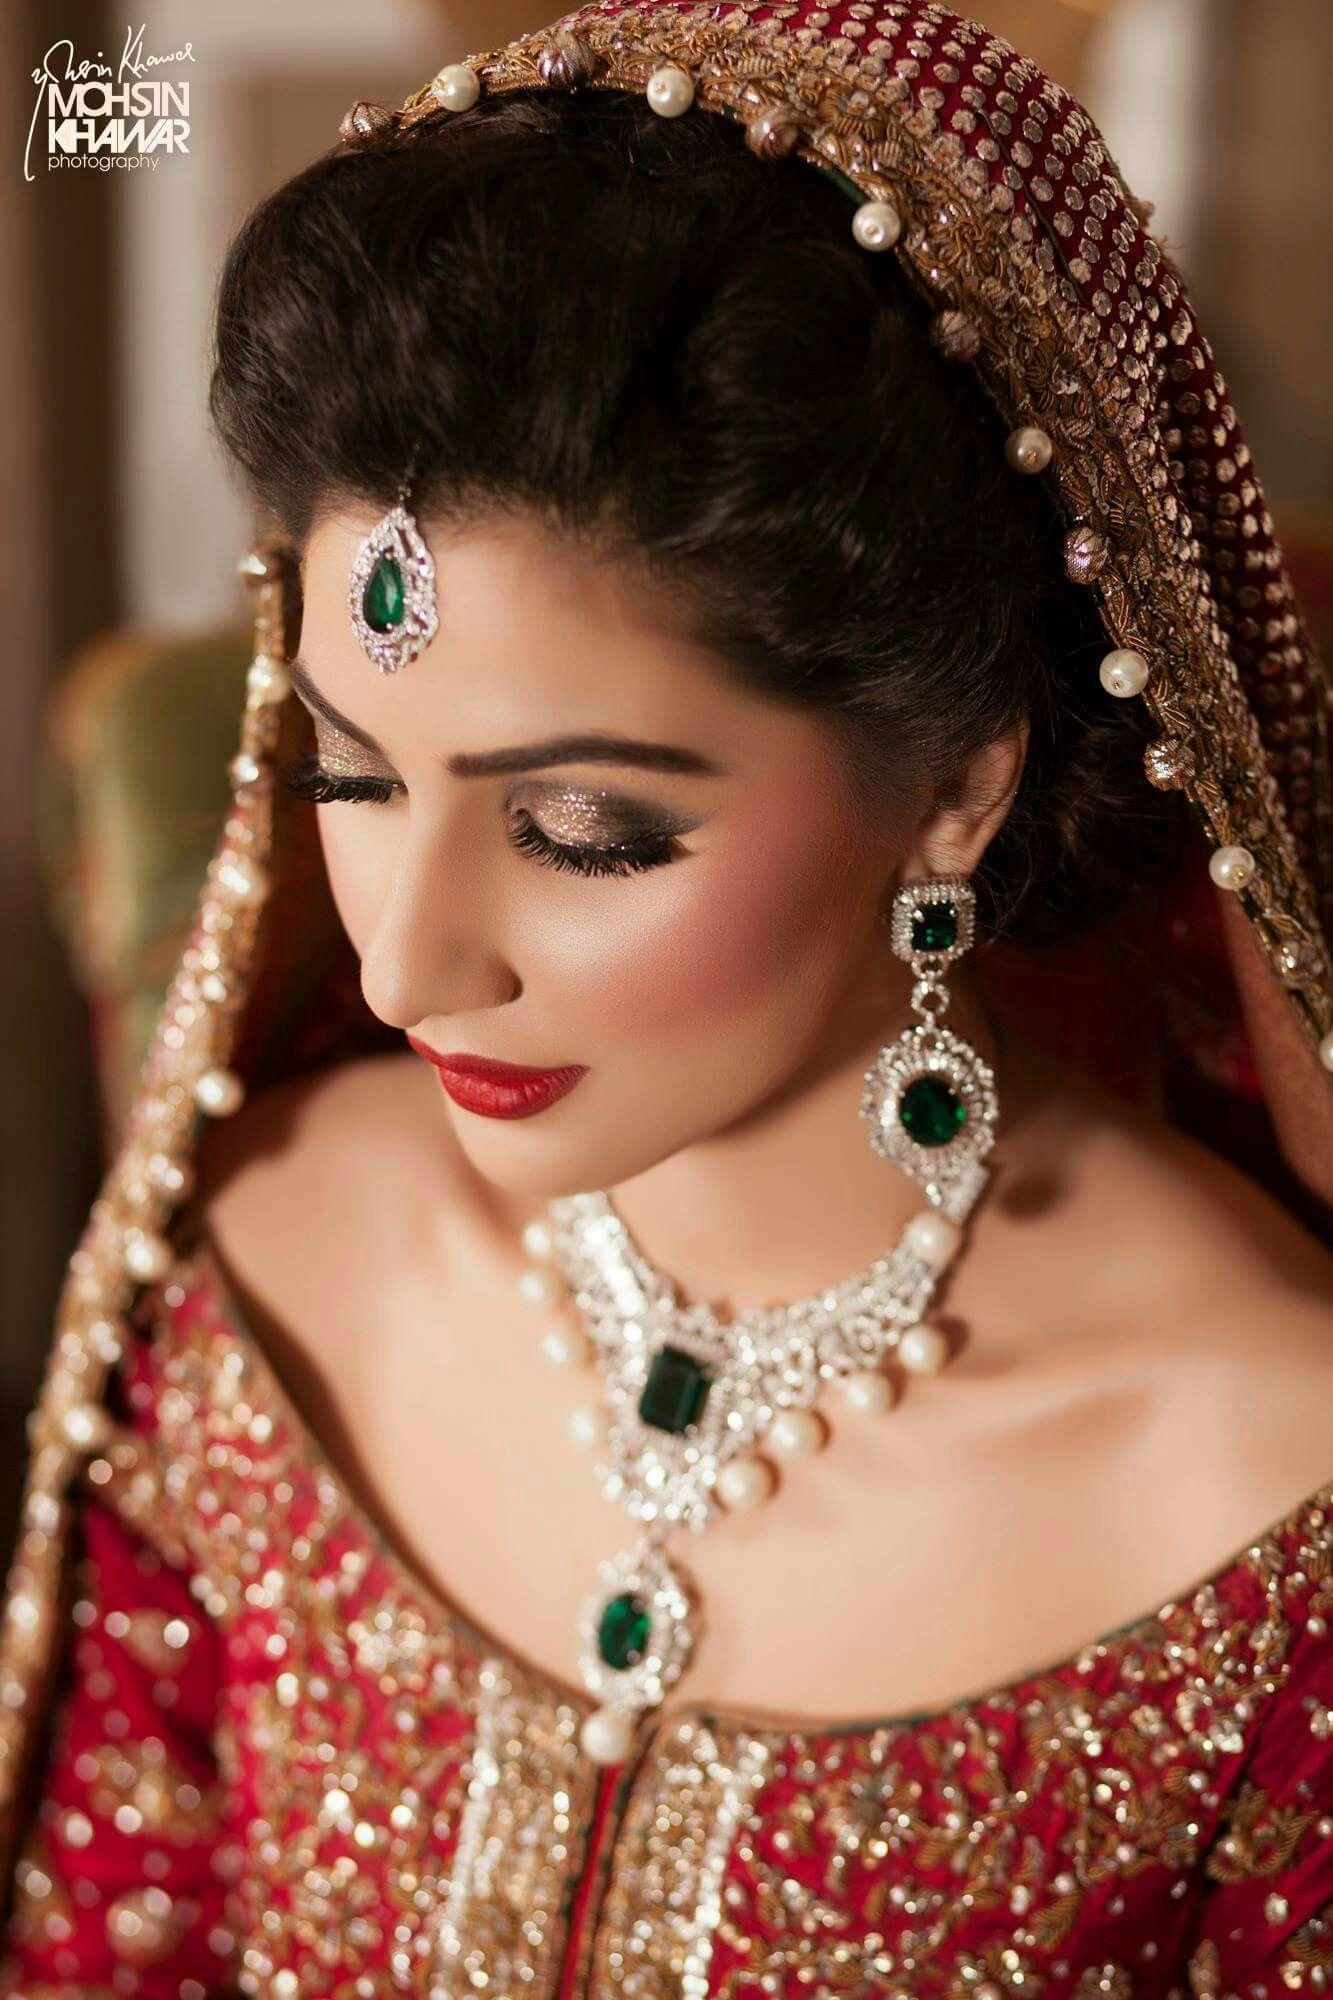 Awesome Pakistani Bridal makeup | P@Ki WeDDiNG | Pakistani ...